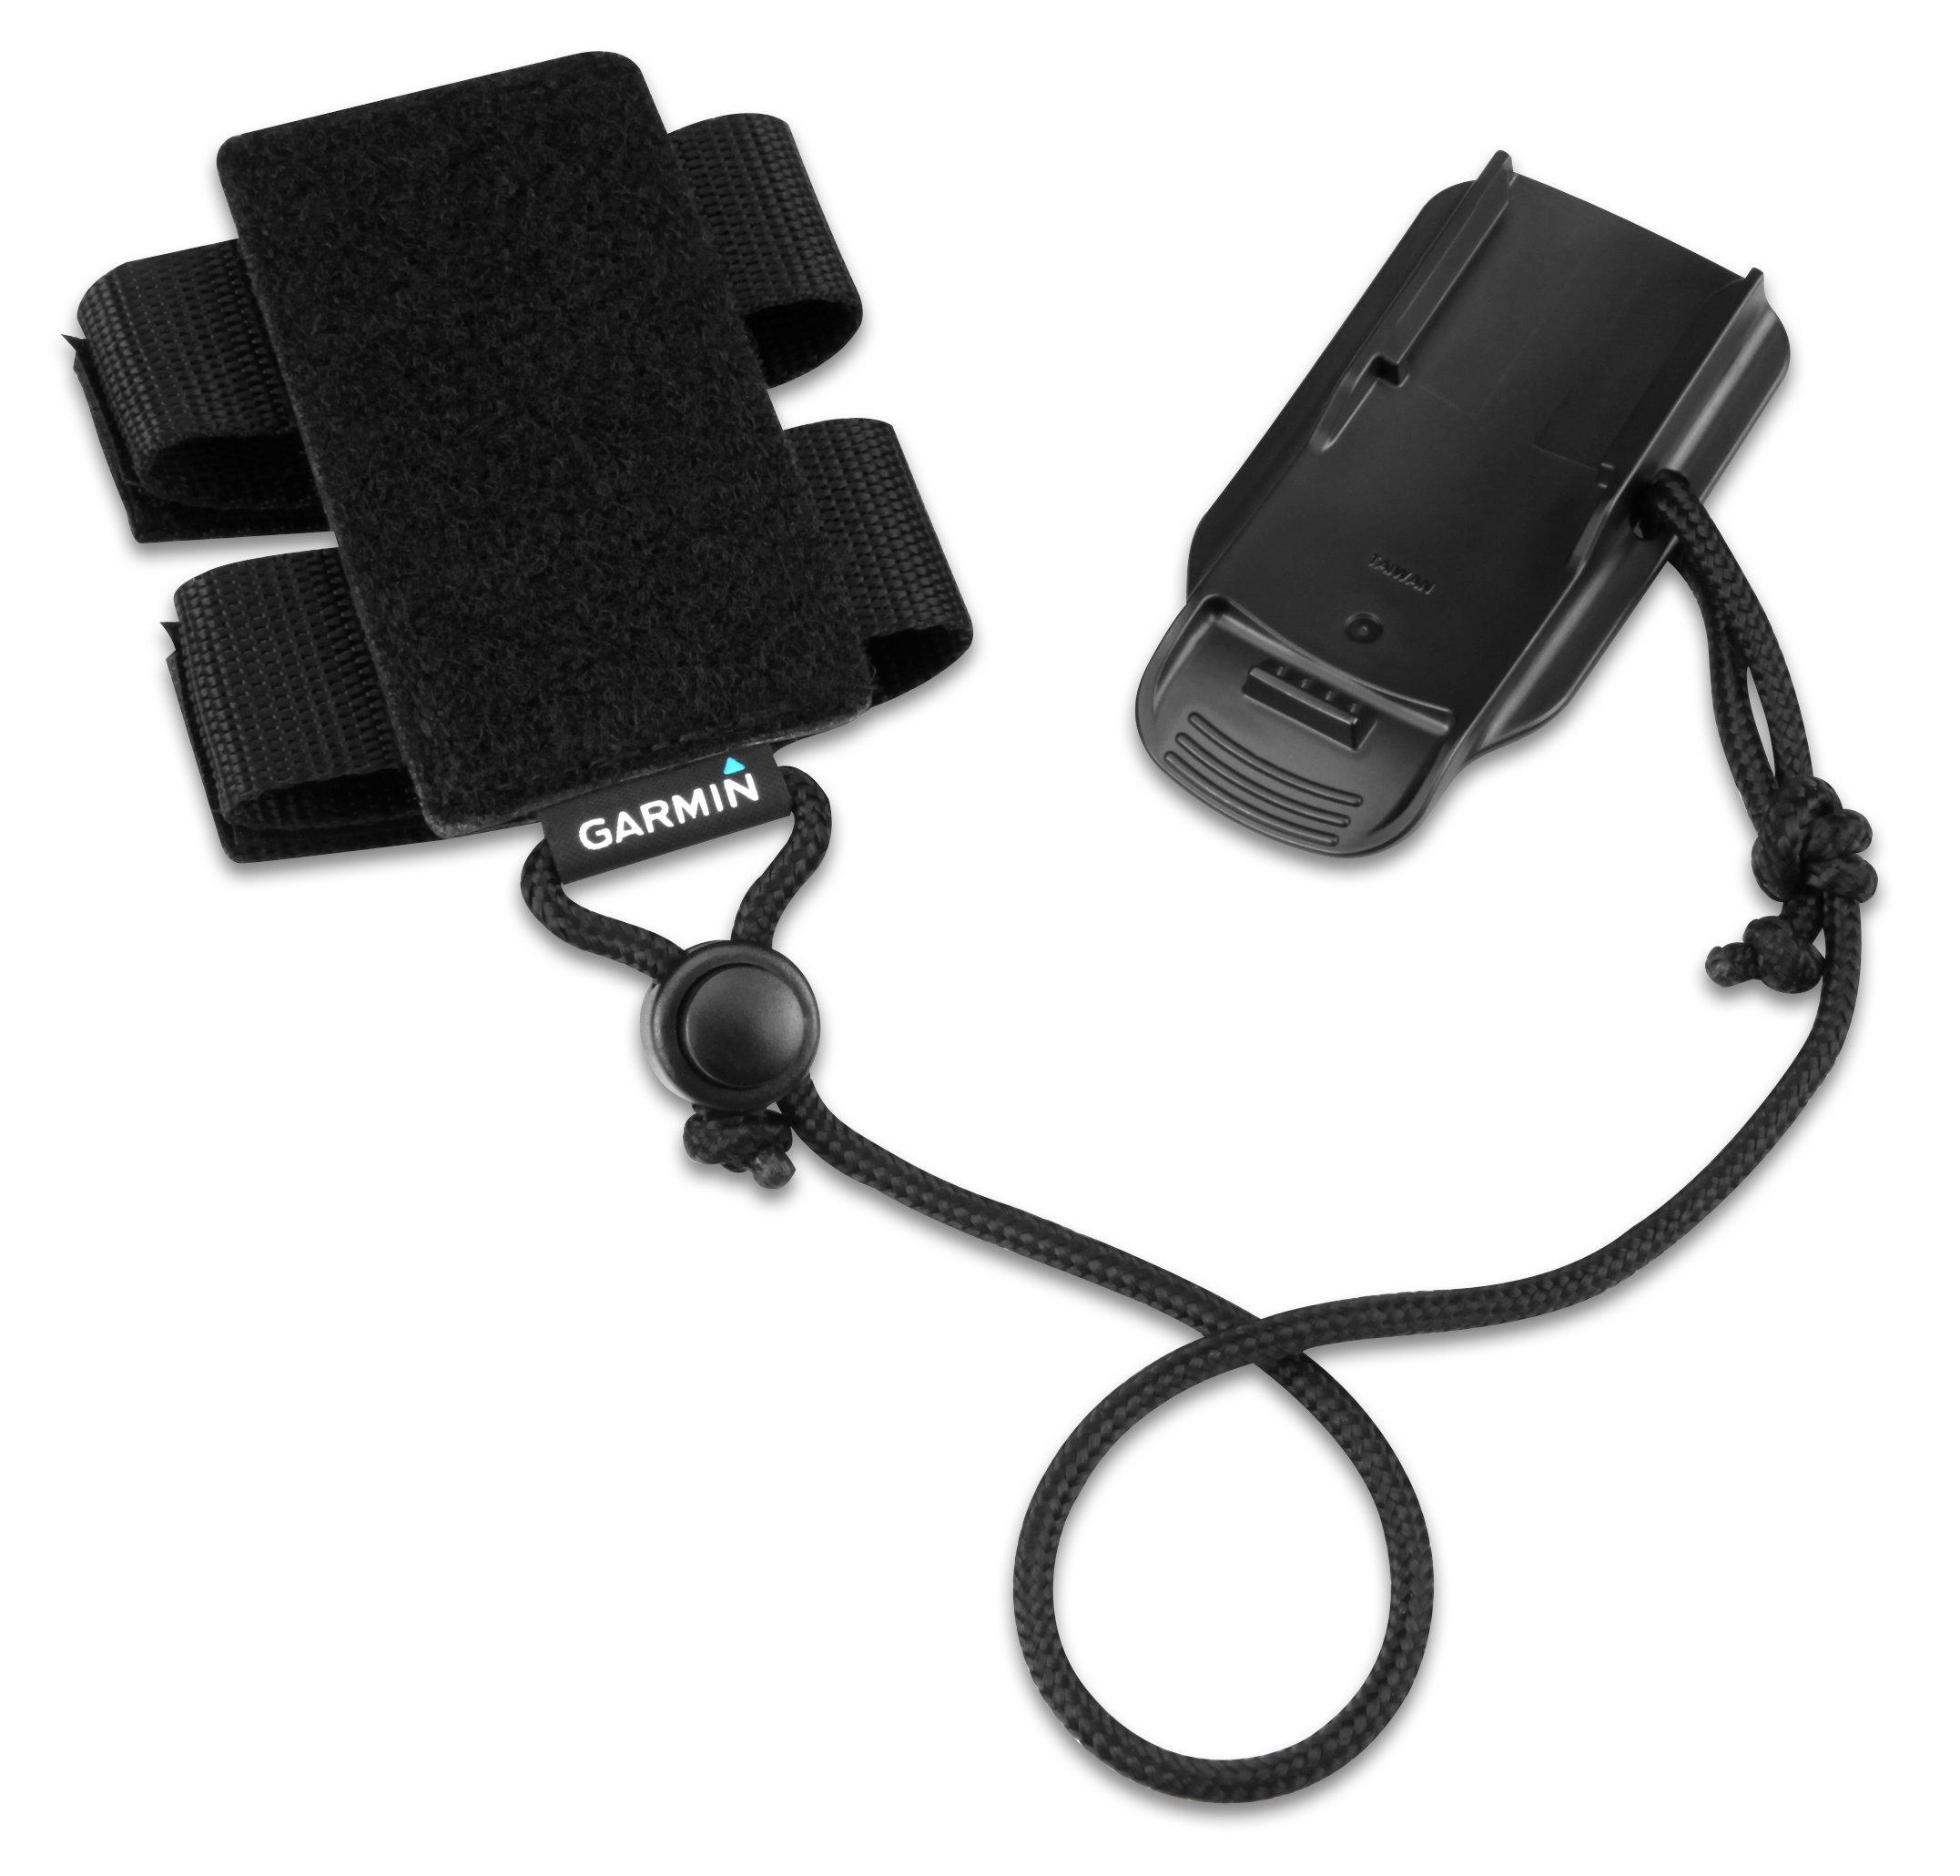 Garmin 010-11855-00 Backpack Tether for GPS Devices, Black